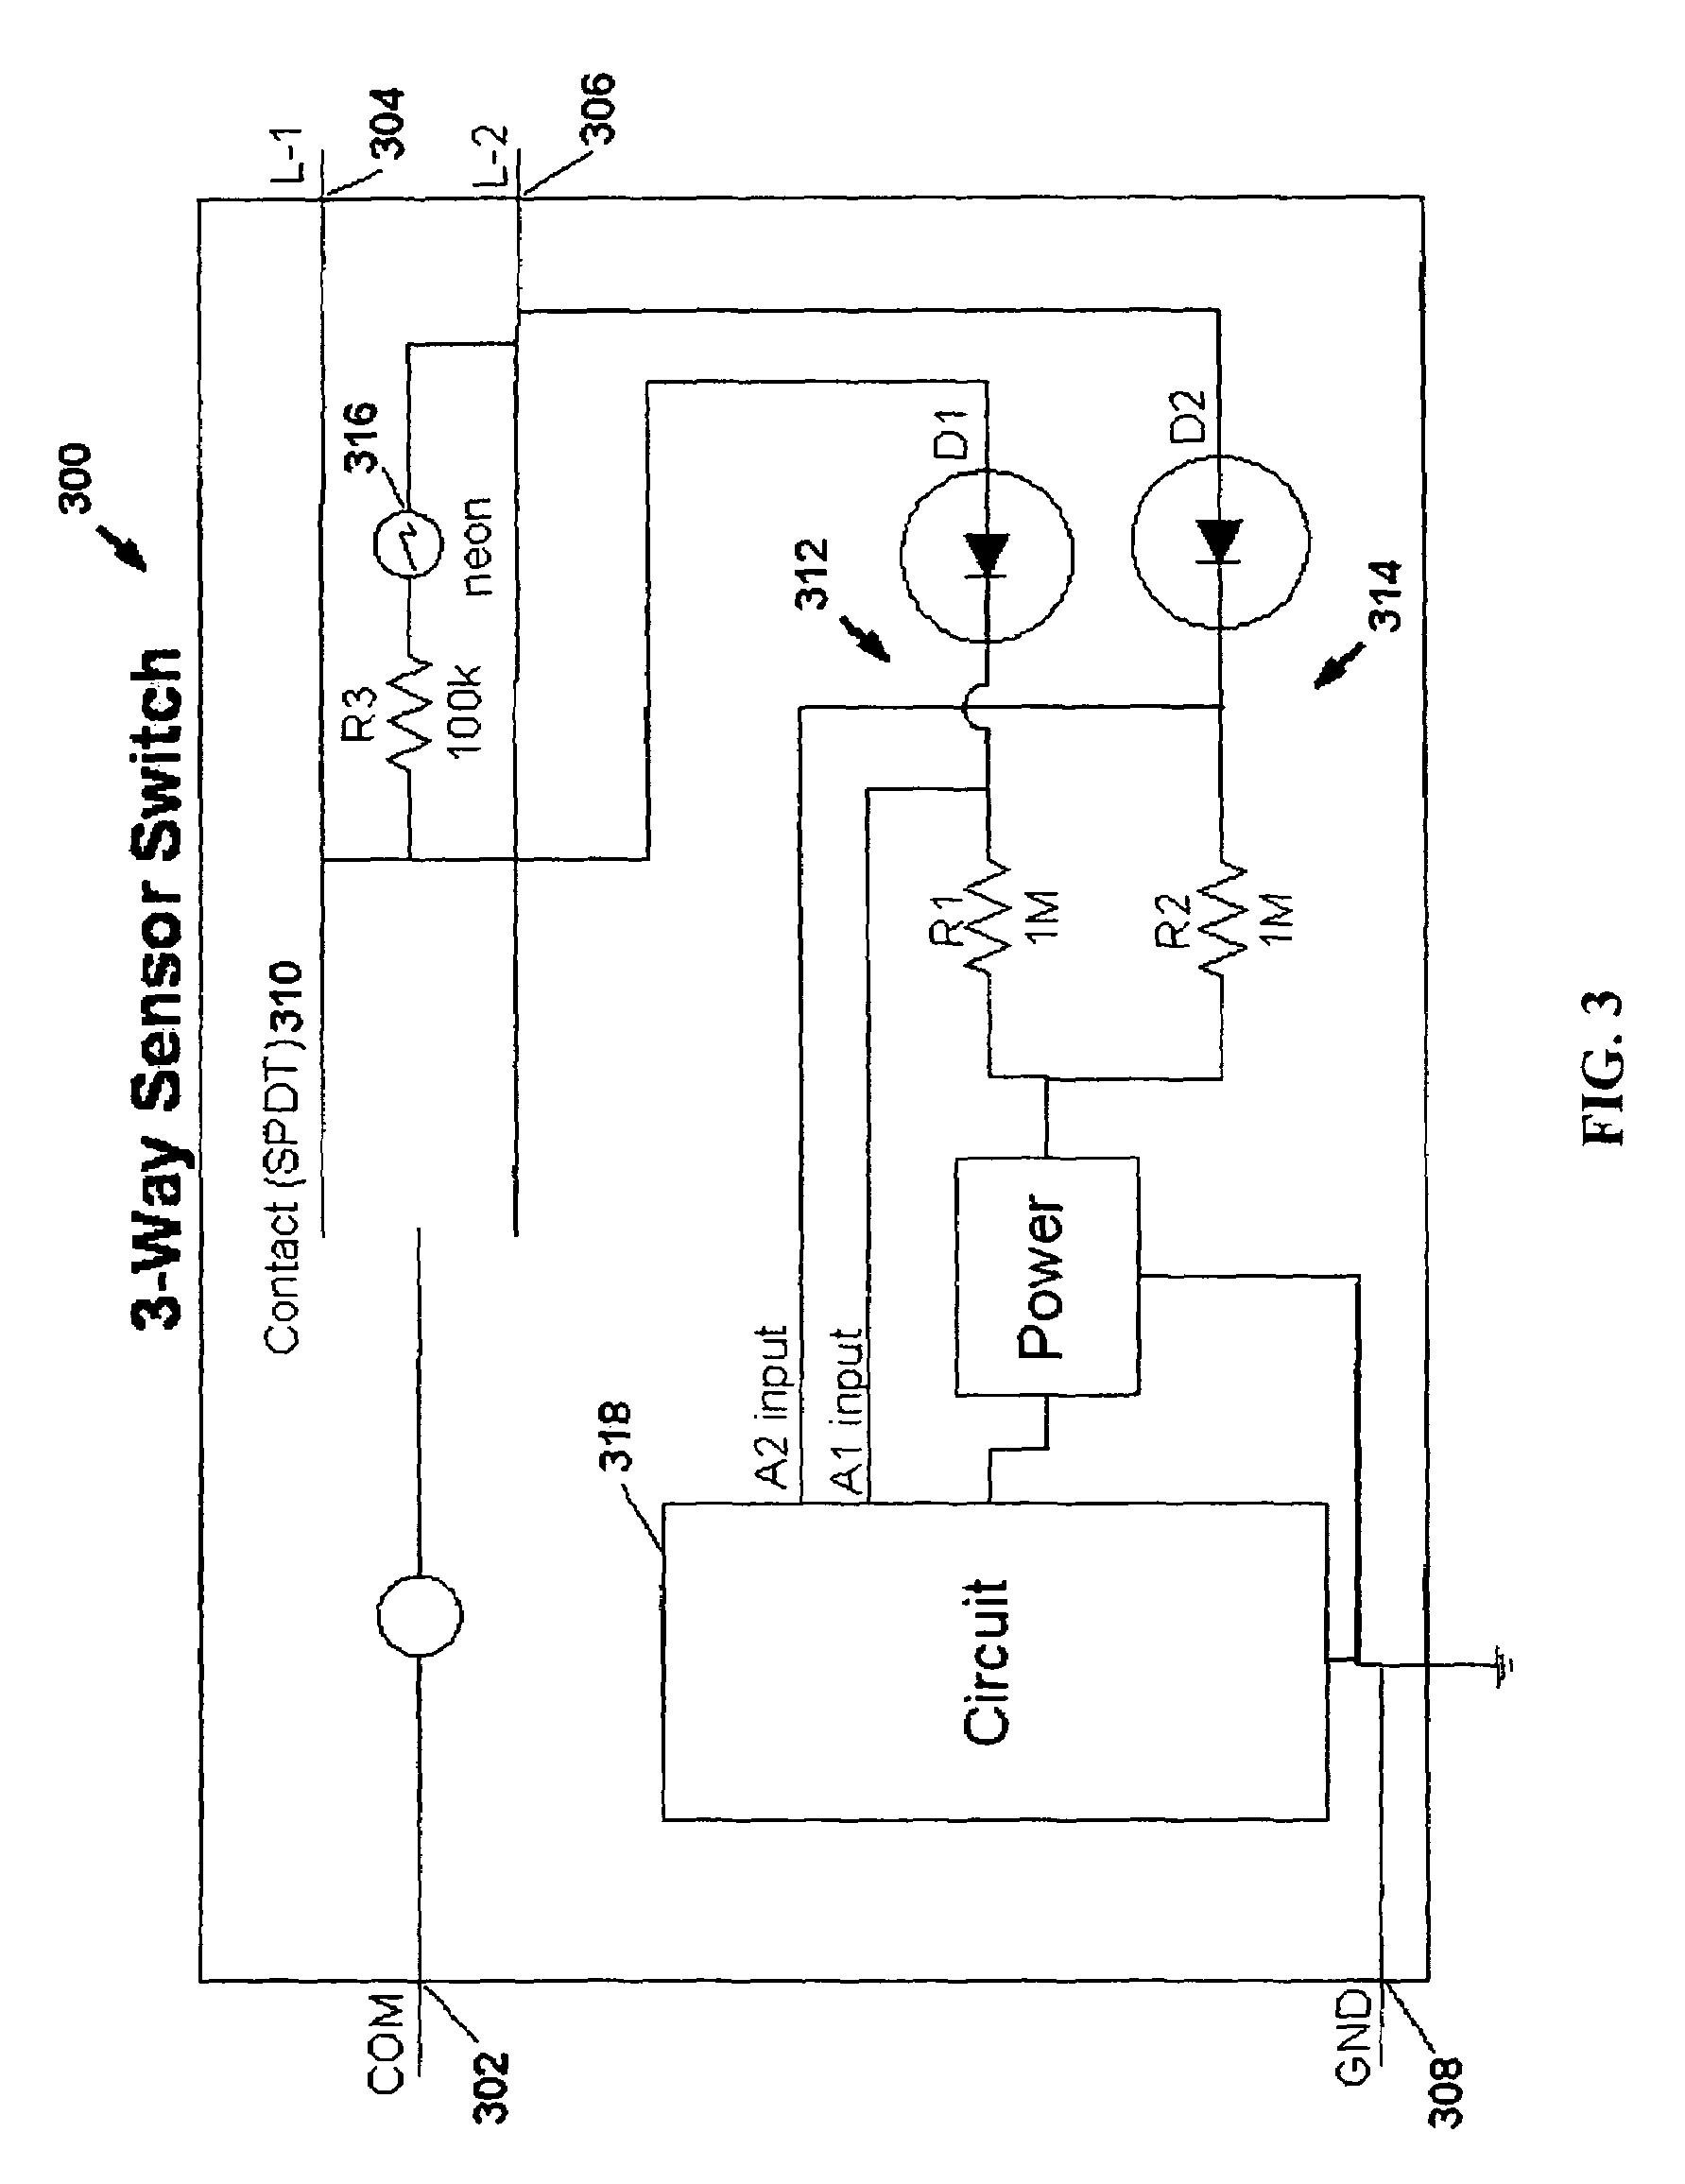 Rabb Occupancy Sensor Switch Wiring Diagram on